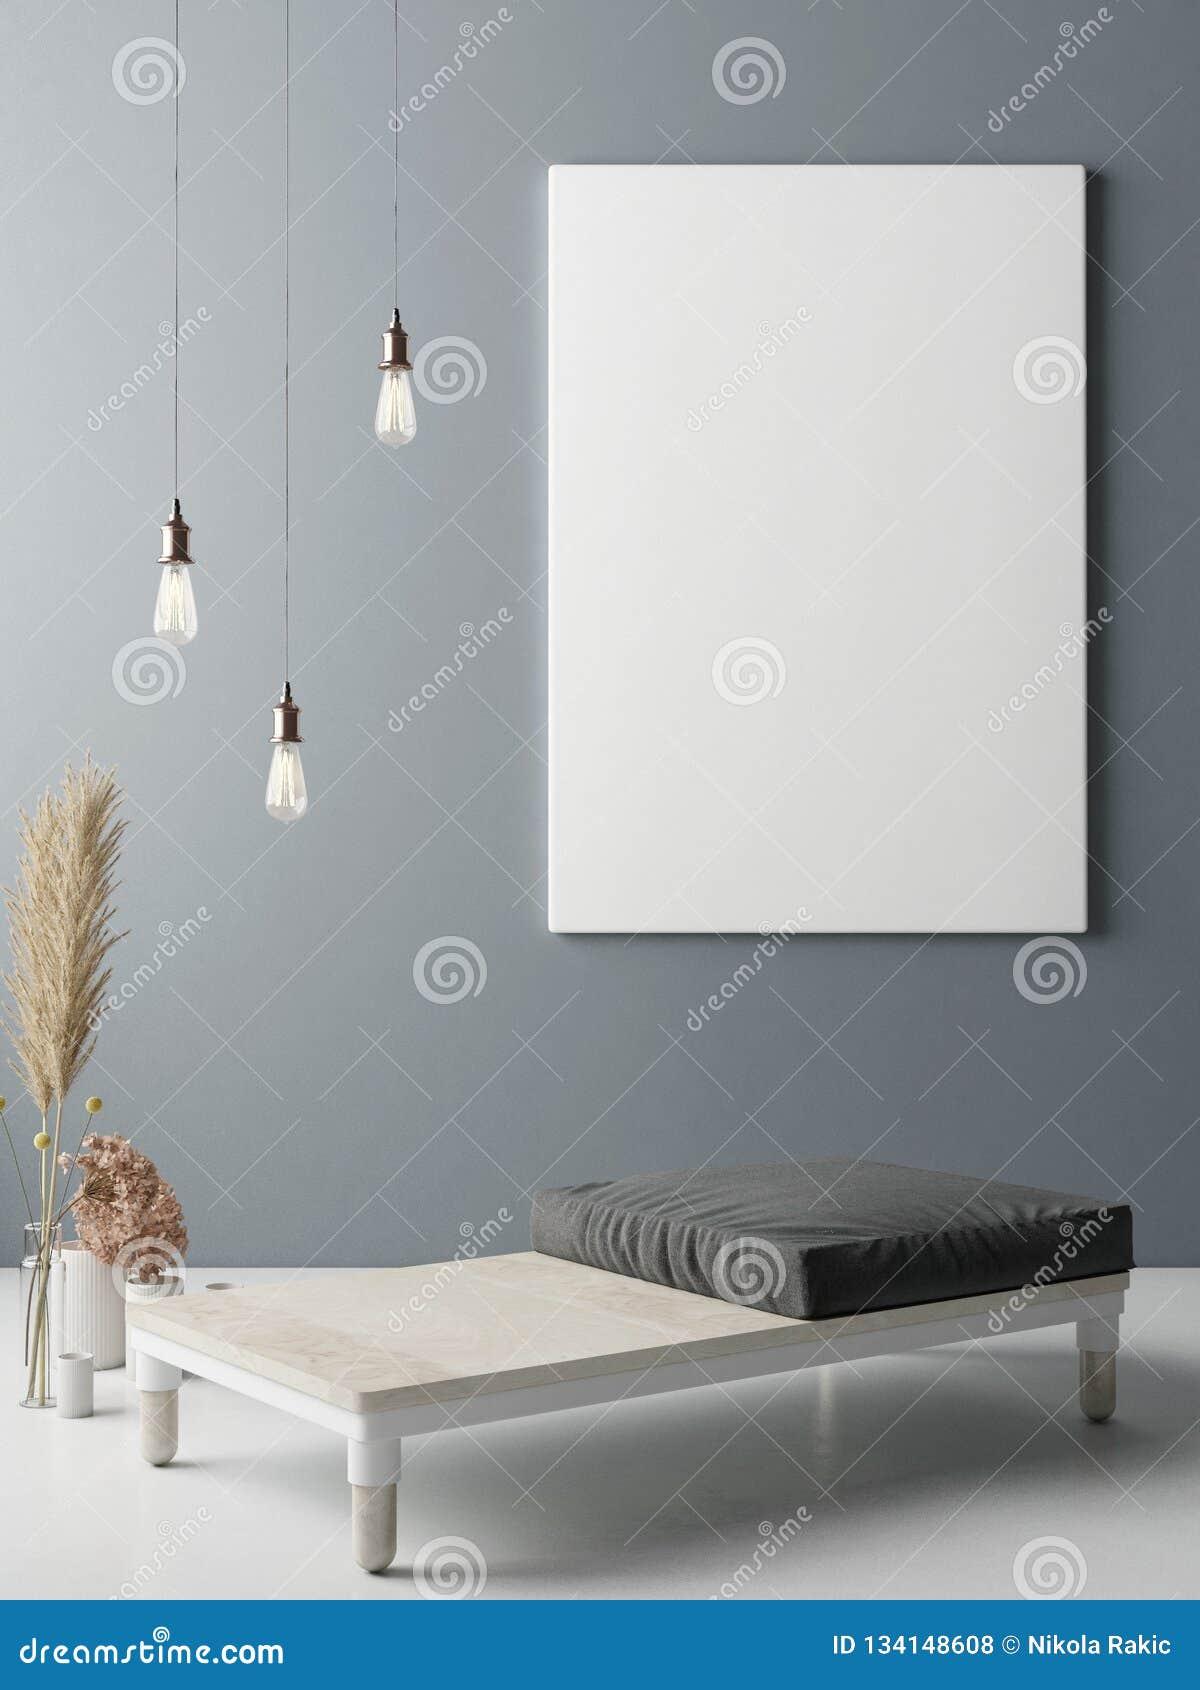 Mock up poster on wall, Minimalism interior design